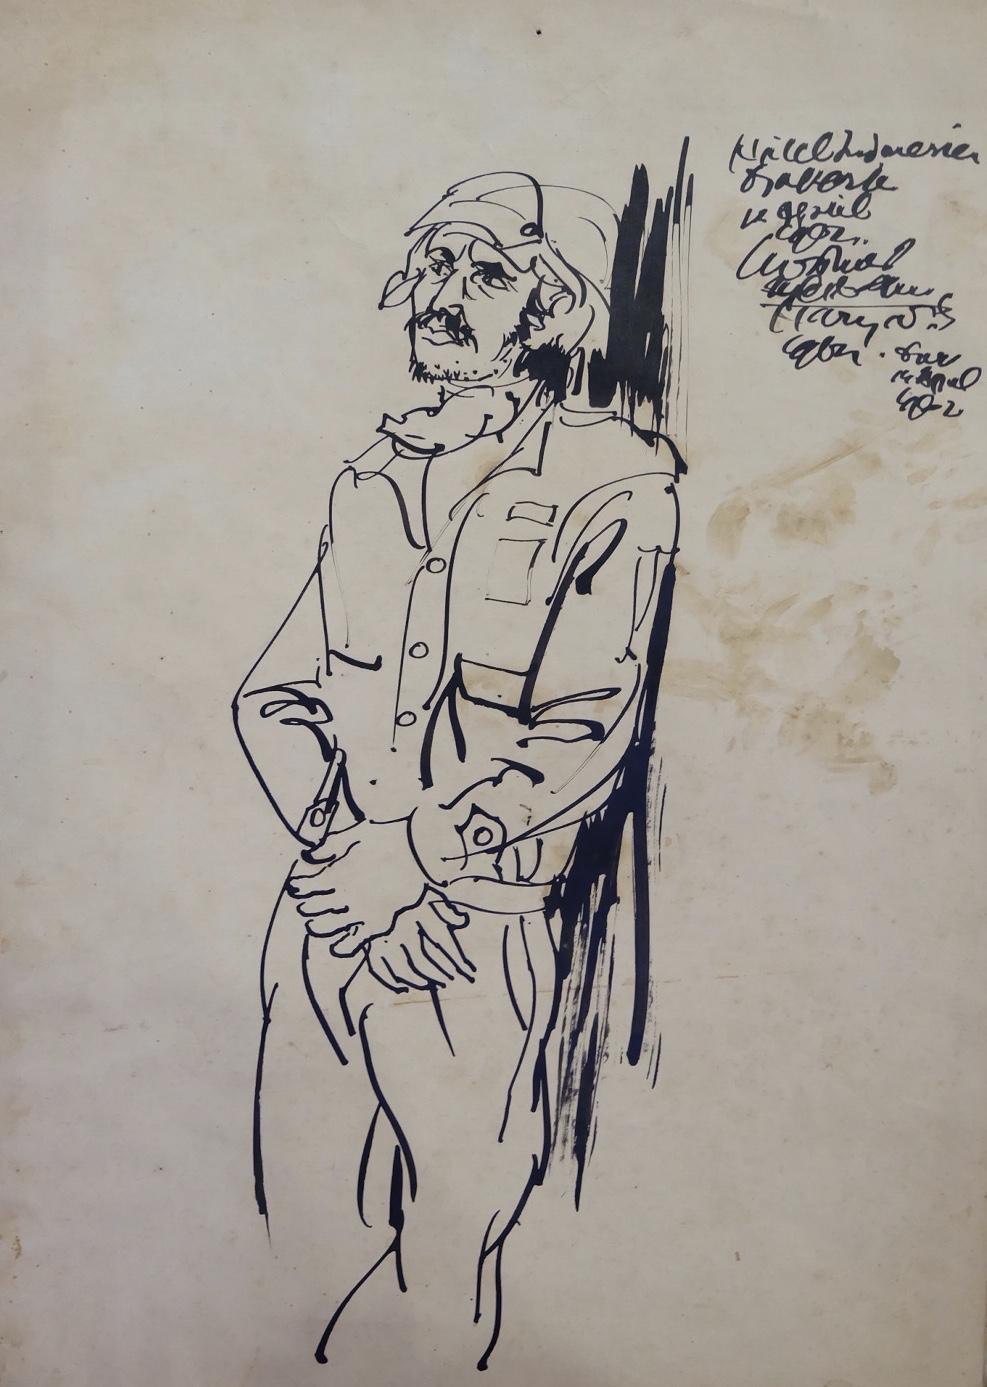 Artist: Harijadi Sumodidjojo, b.1919 (Indonesia)  Title: Medium: ink on paper Dimension: 21 cm x 30 cm Year: 1962